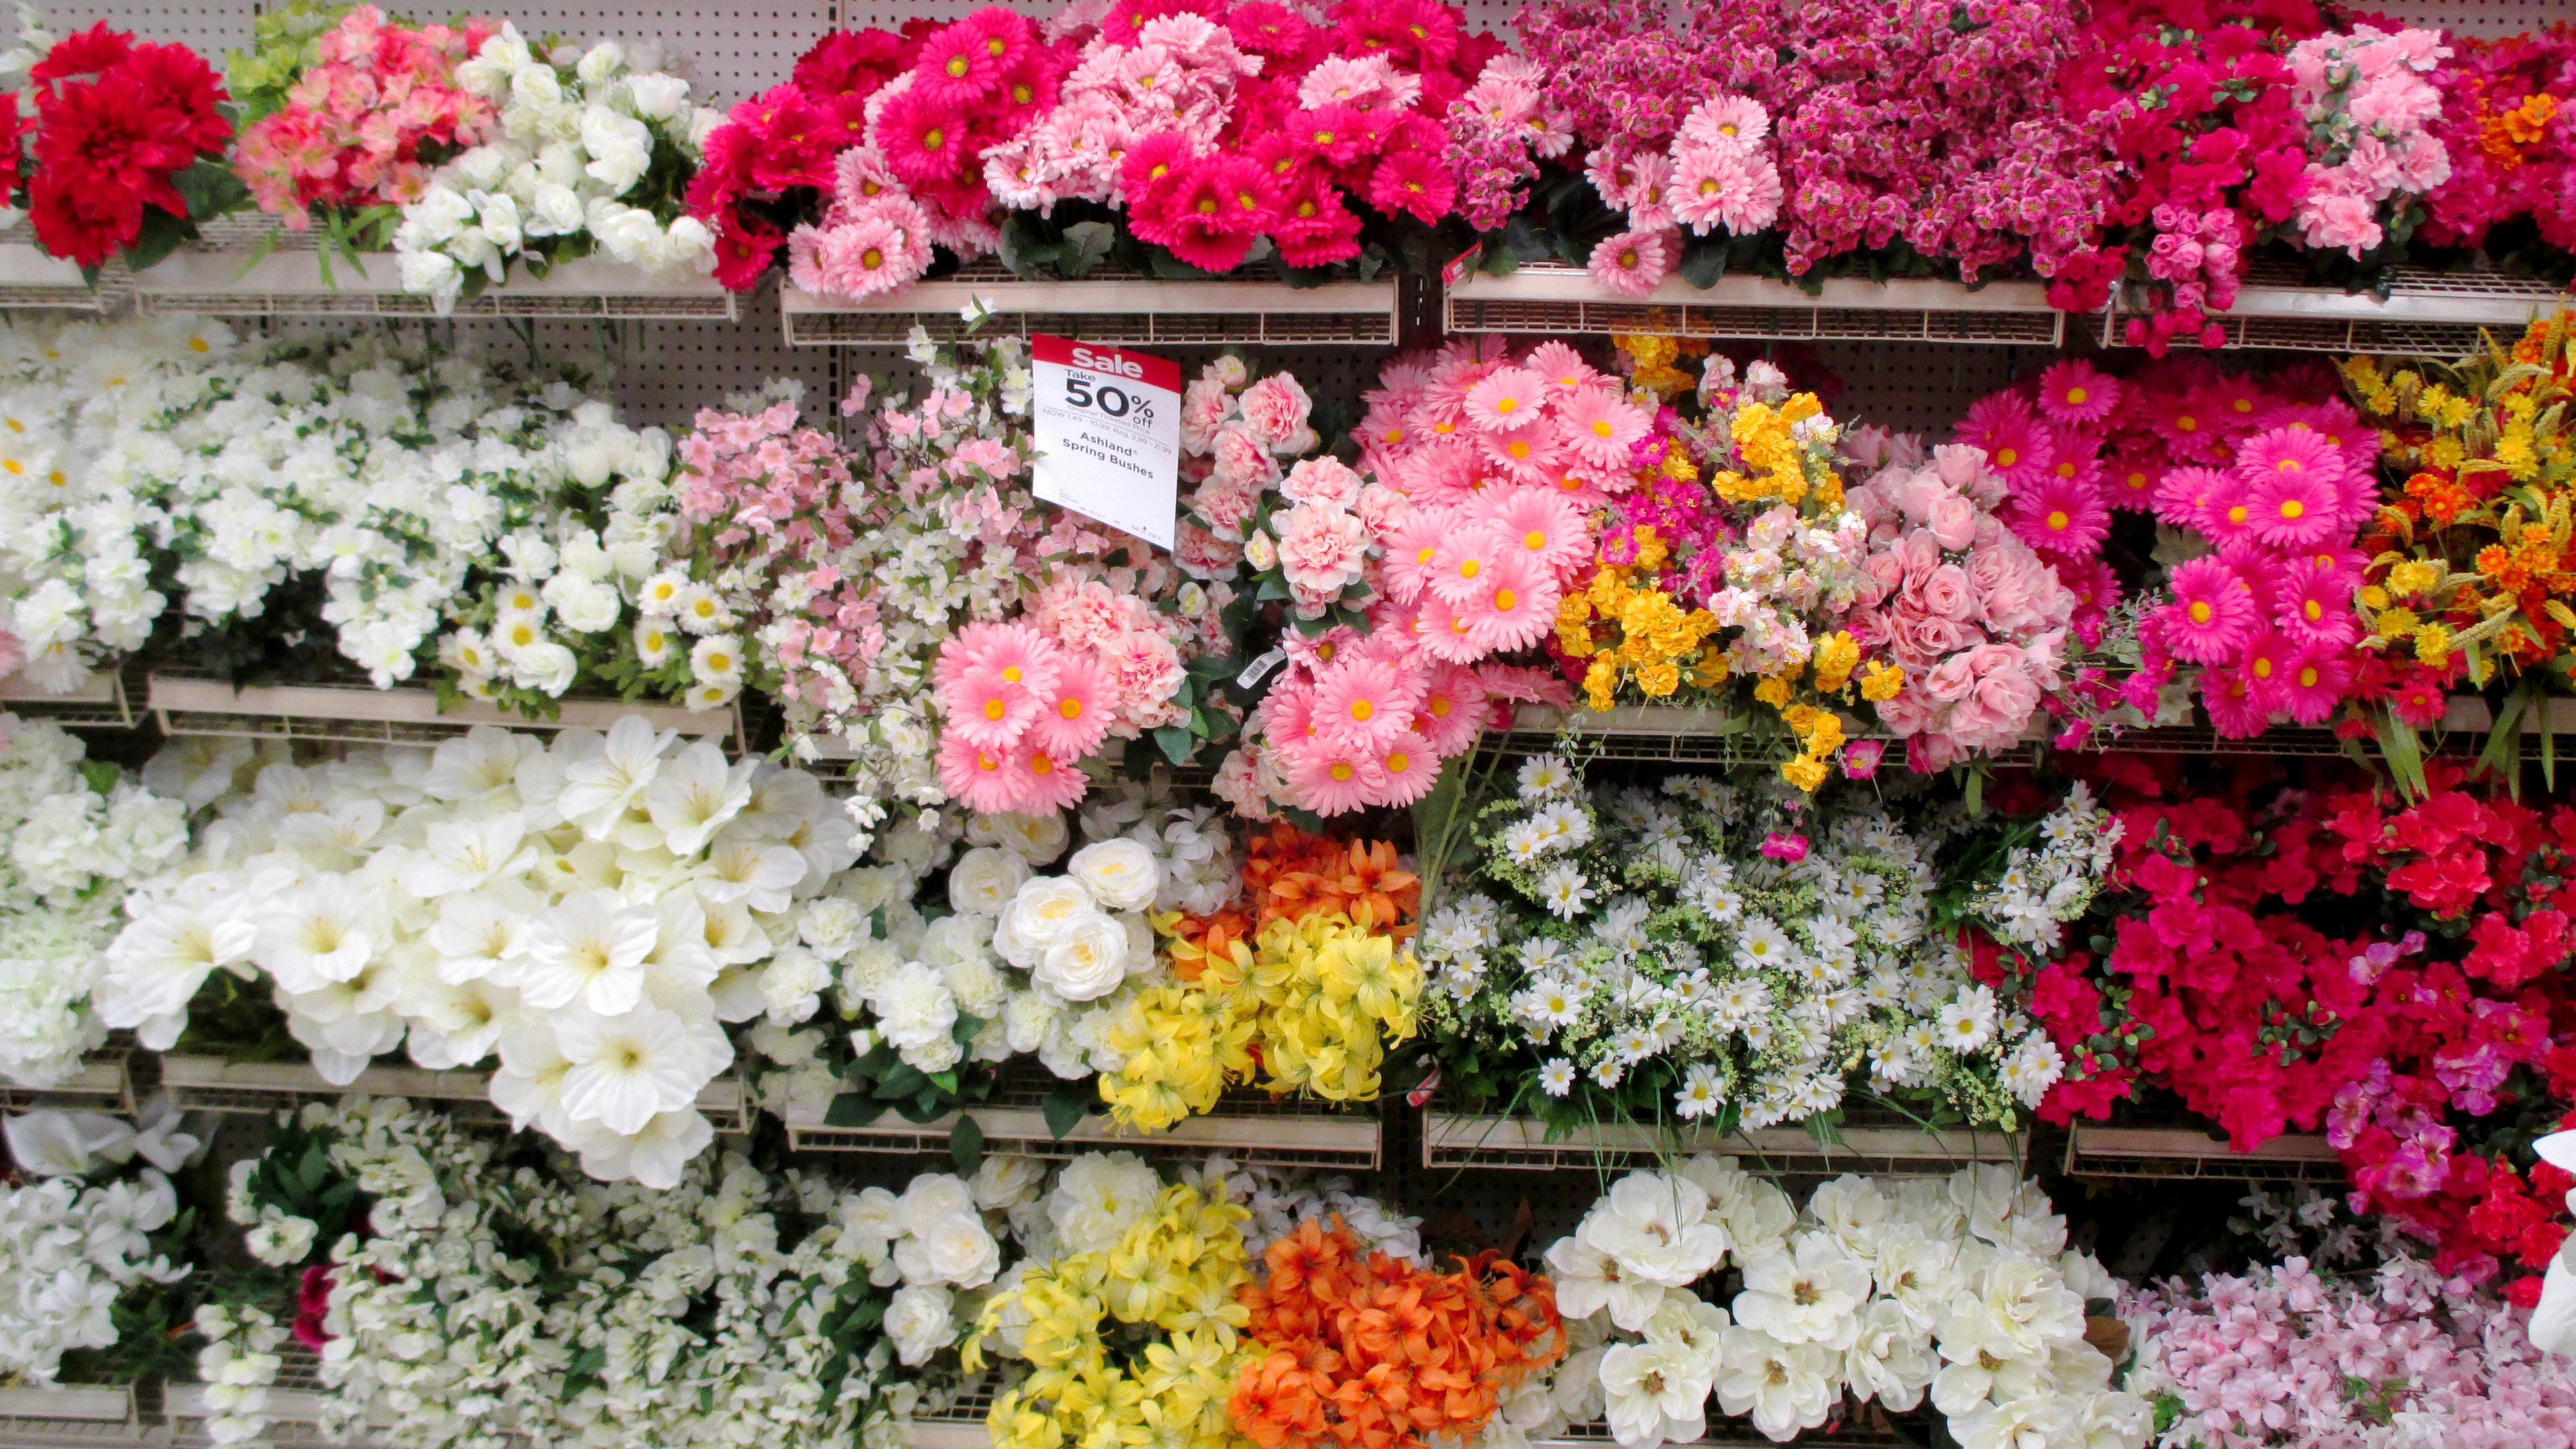 28 Popular Baccarat Vase Ebay 2021 free download baccarat vase ebay of http pandoraocharms us artificial cemetery flowers http regarding michaels artificial flowers 35 bord eaux